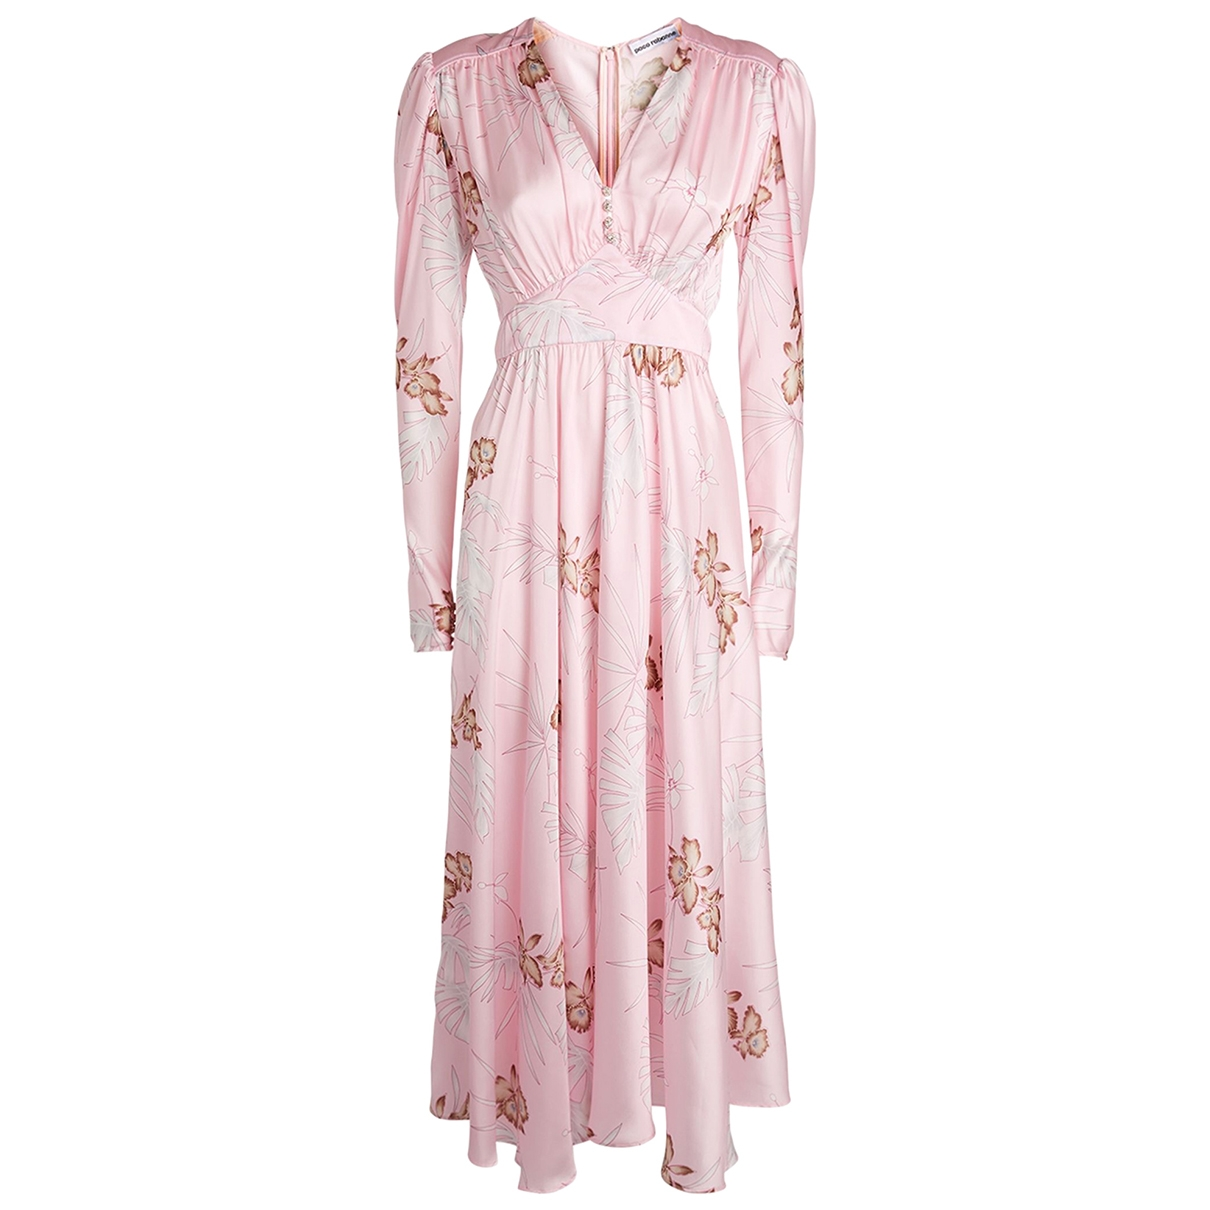 Paco Rabanne \N Pink dress for Women 40 FR